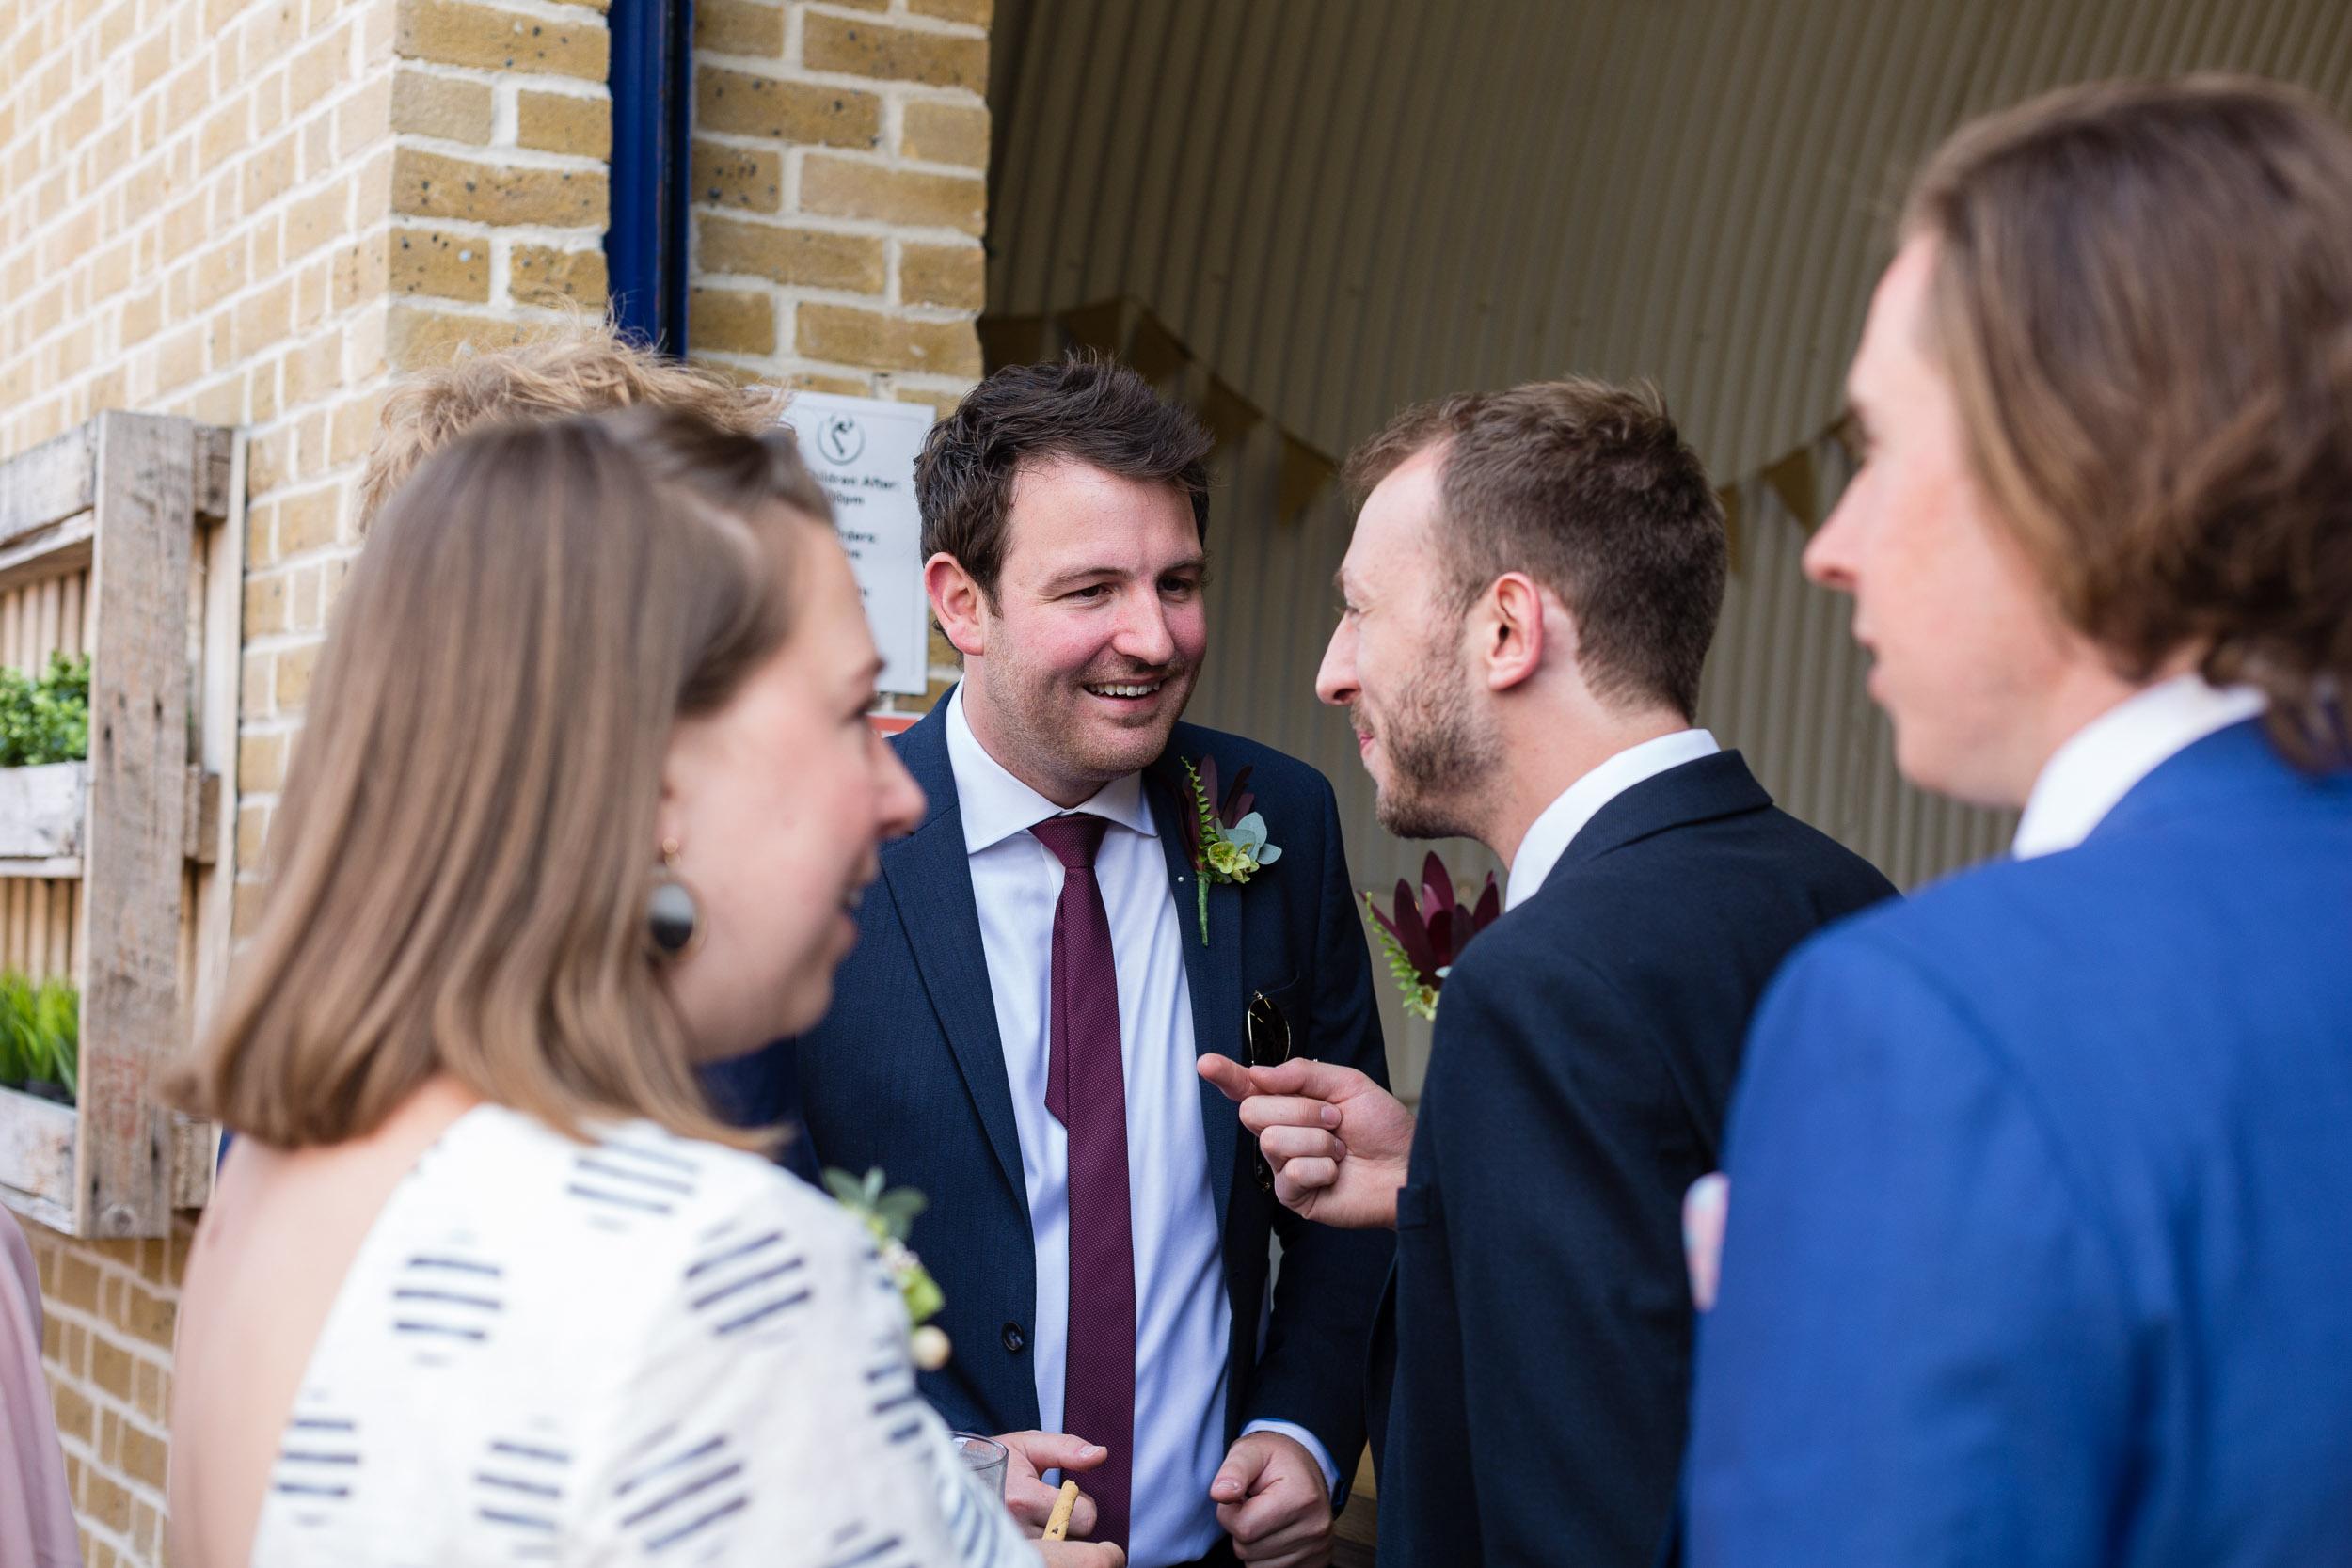 brockwell-lido-brixton-herne-hill-wedding-068.jpg